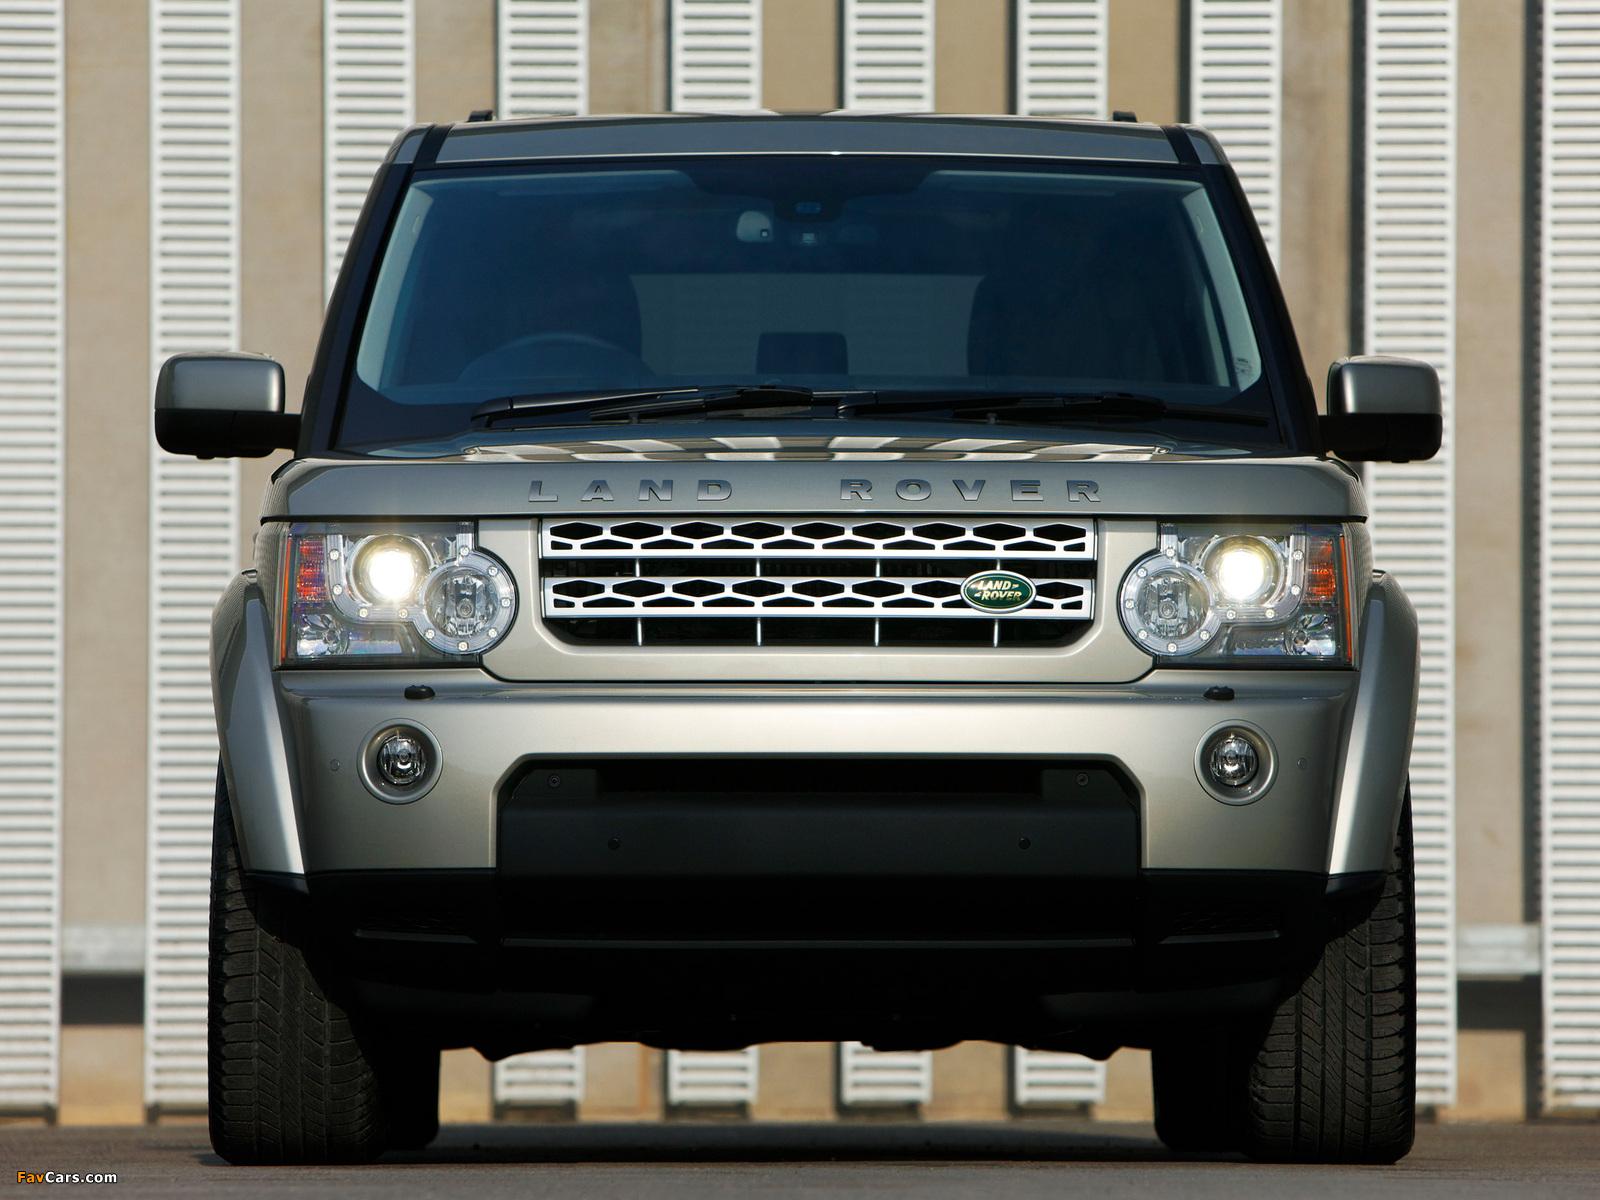 Land Rover LR4 2009 images (1600 x 1200)